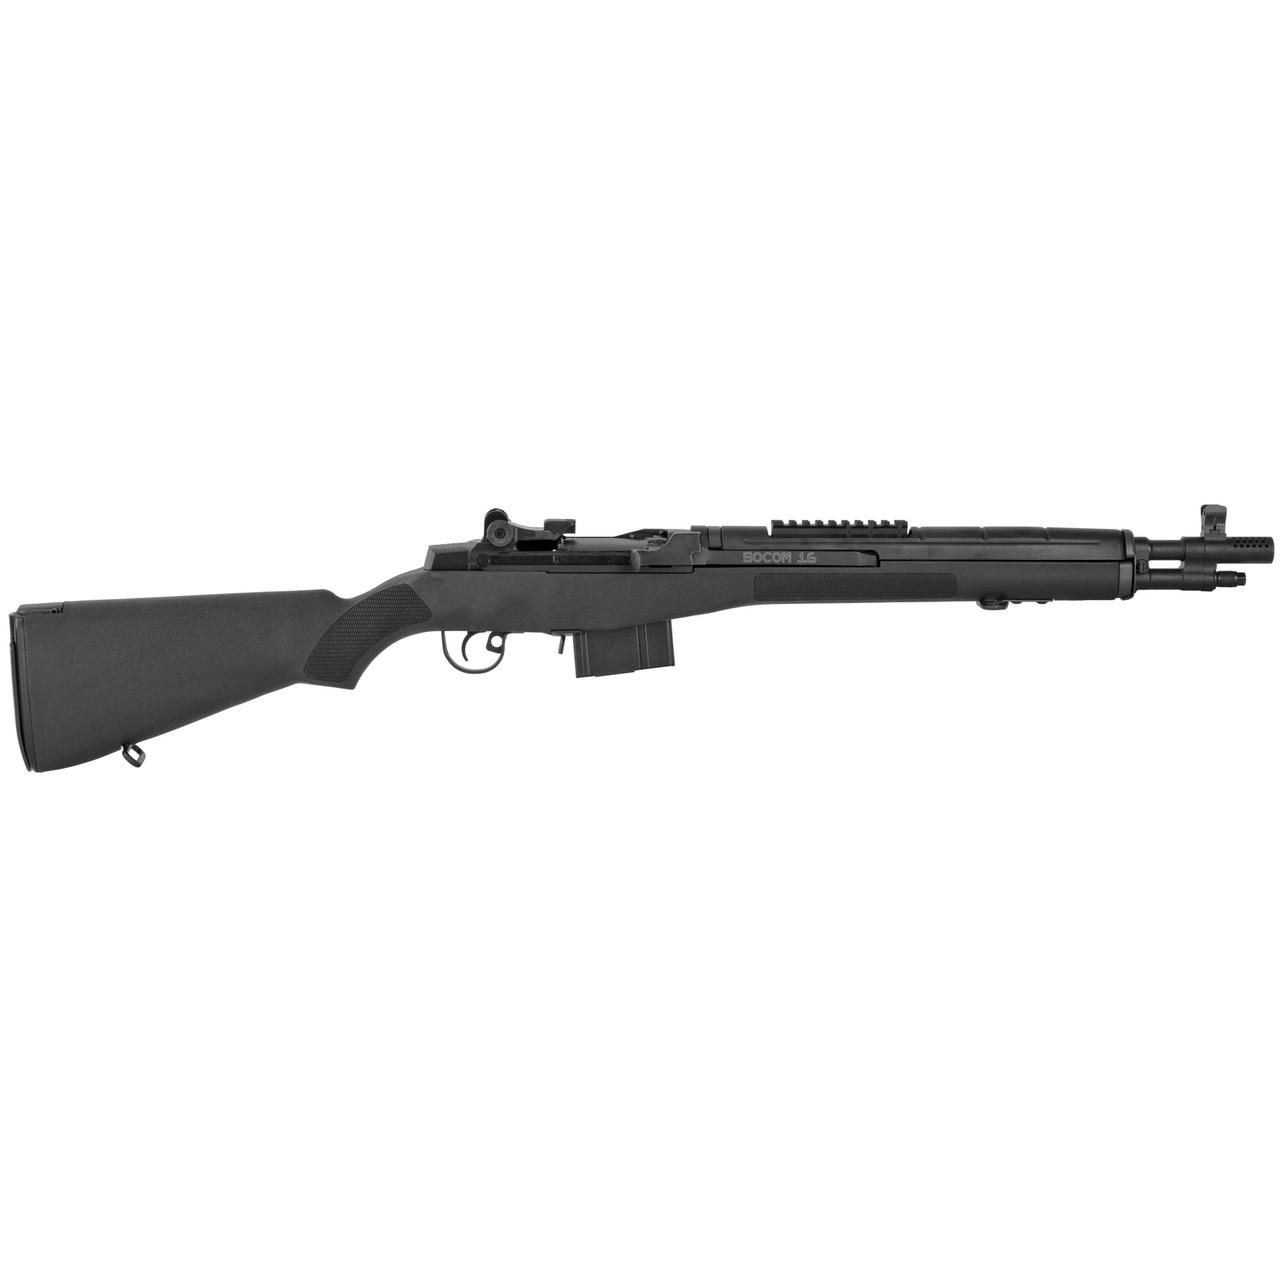 "Springfield M1A SOCOM 16.25"" CALIFORNIA LEGAL - .308/7.62x51"